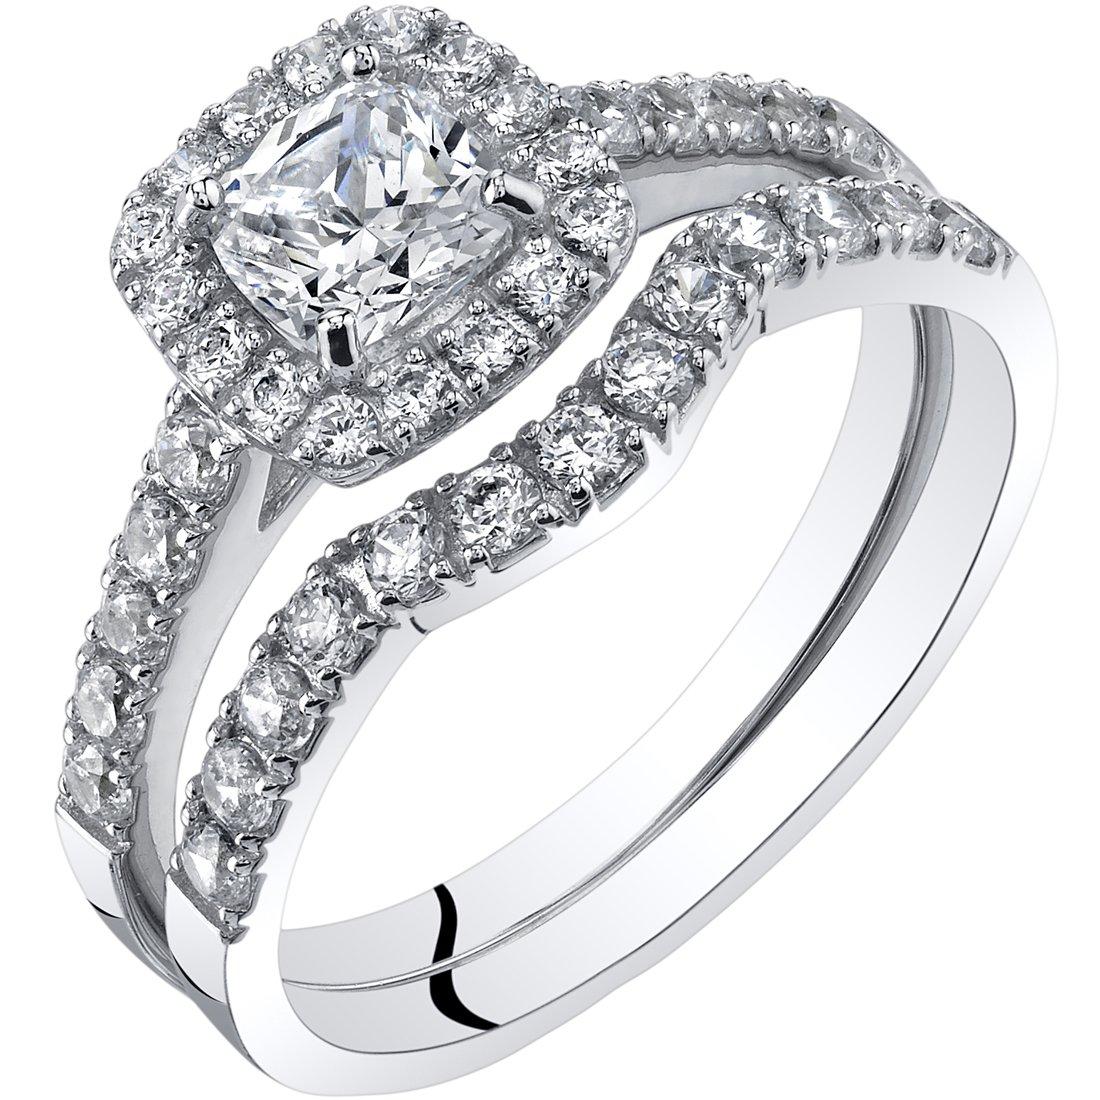 14K White Gold Cushion Cut Engagament Ring and Wedding Band Bridal Set Size 9